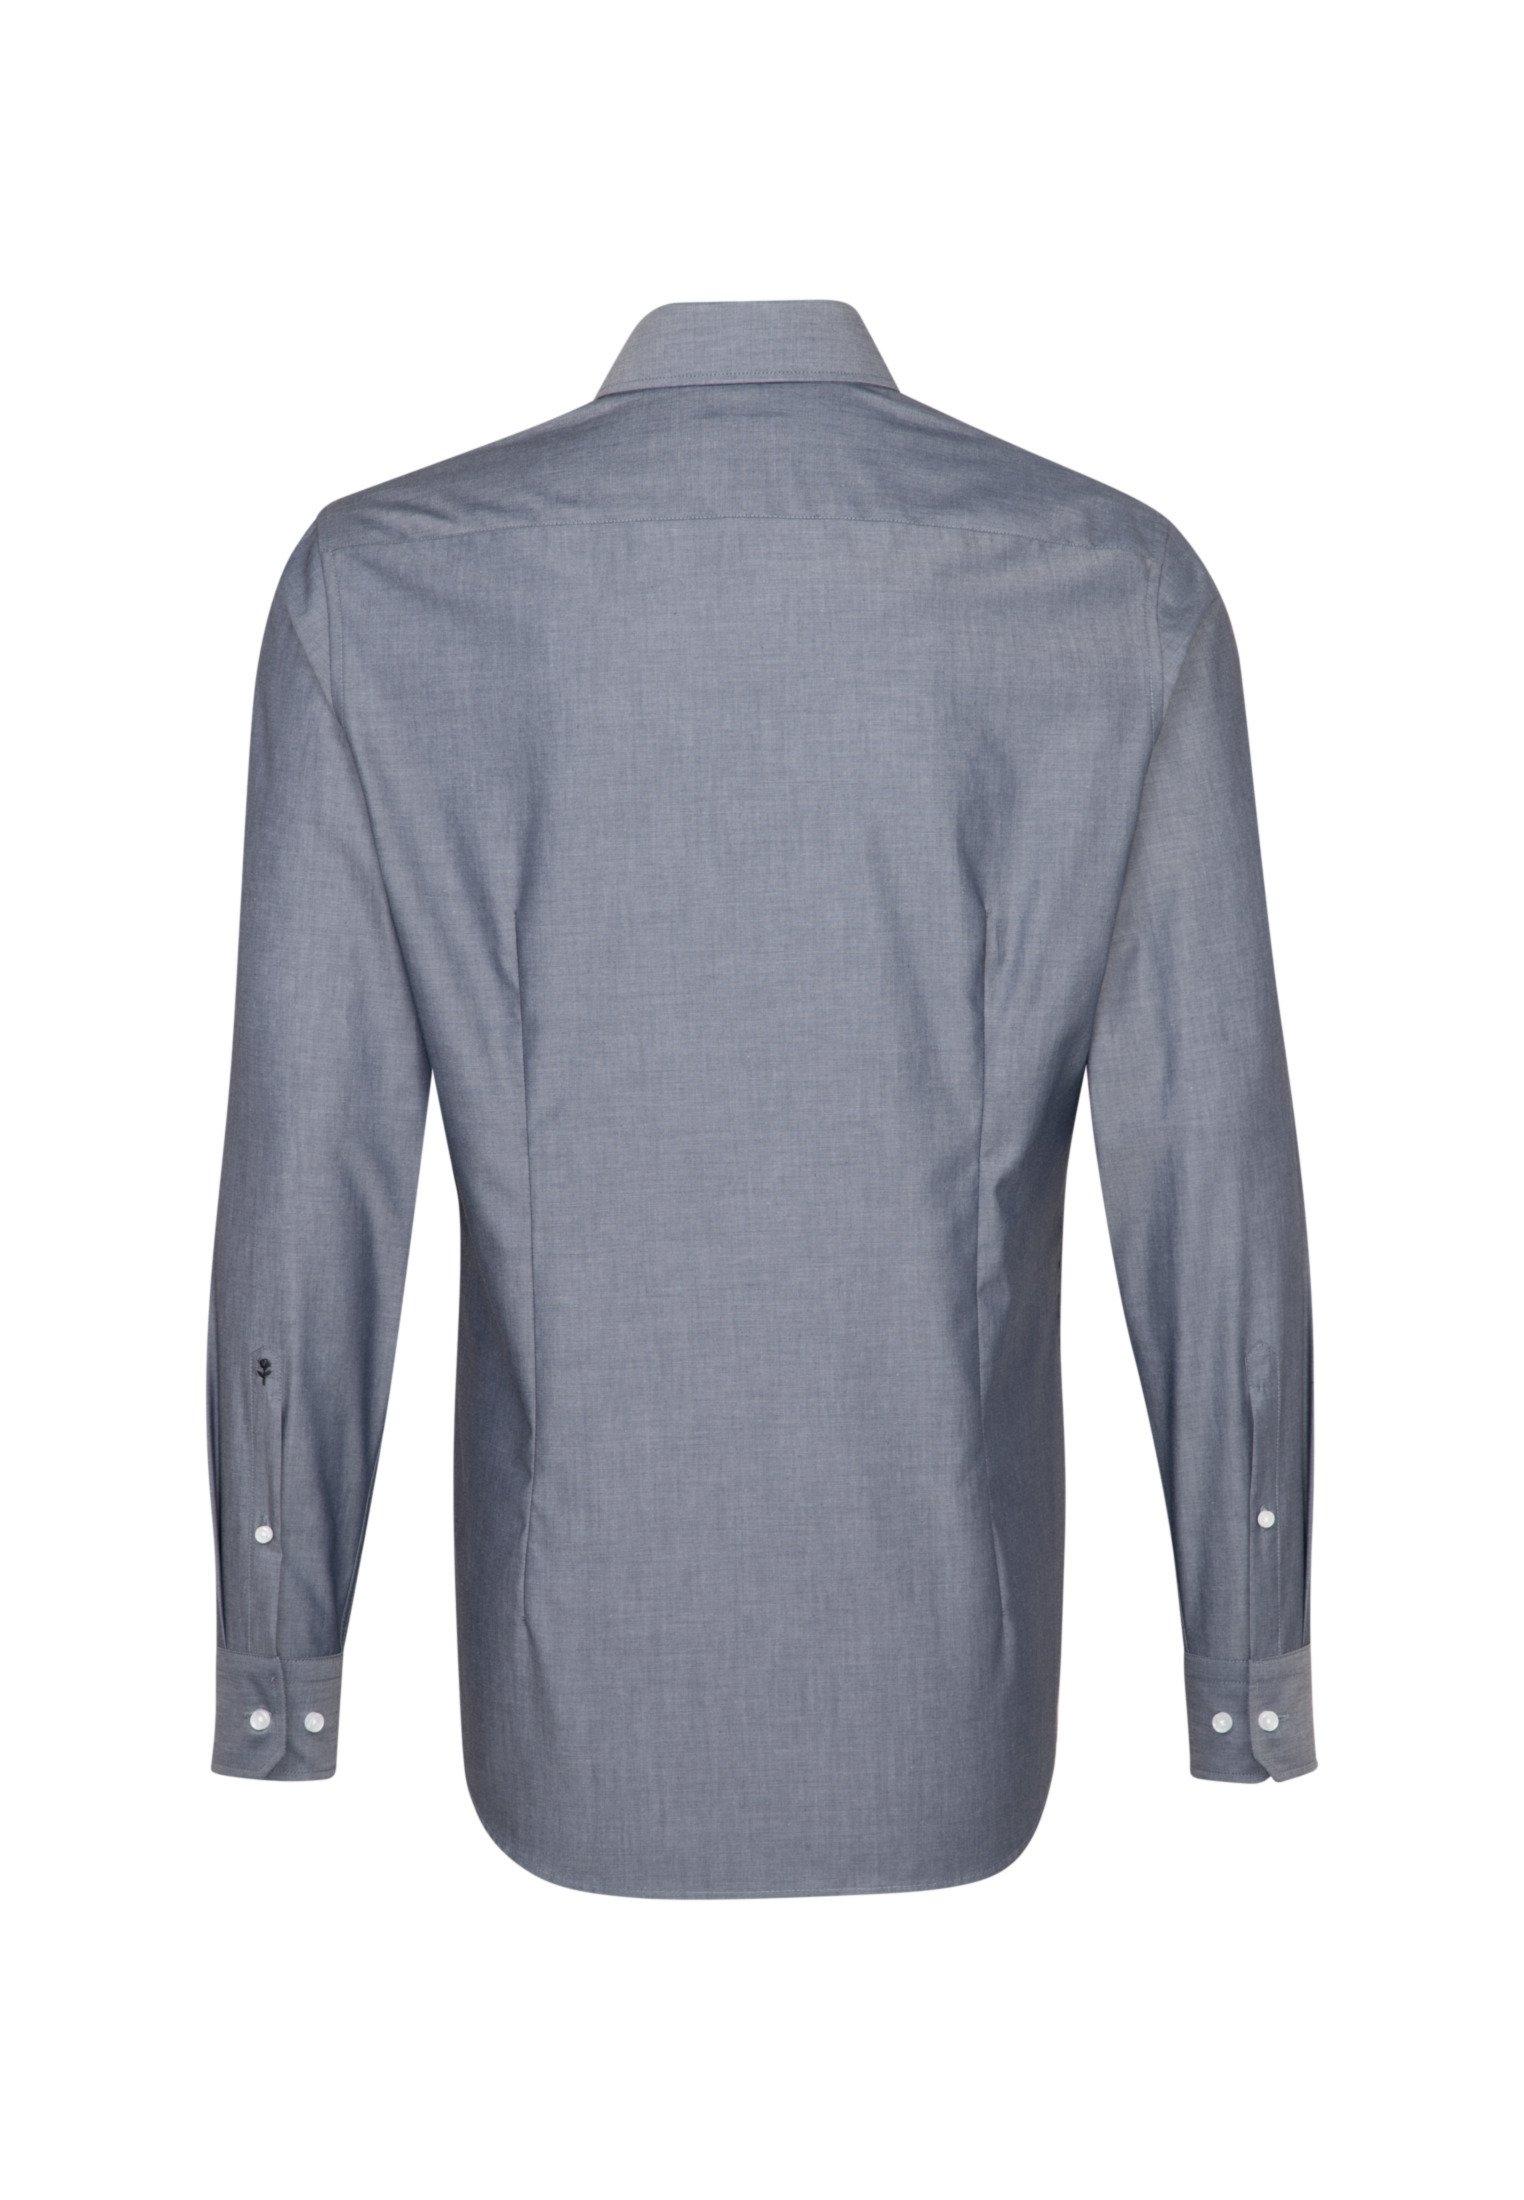 seidensticker businessoverhemd SLIM Slim lange mouwen kentkraag uni bij OTTO online kopen